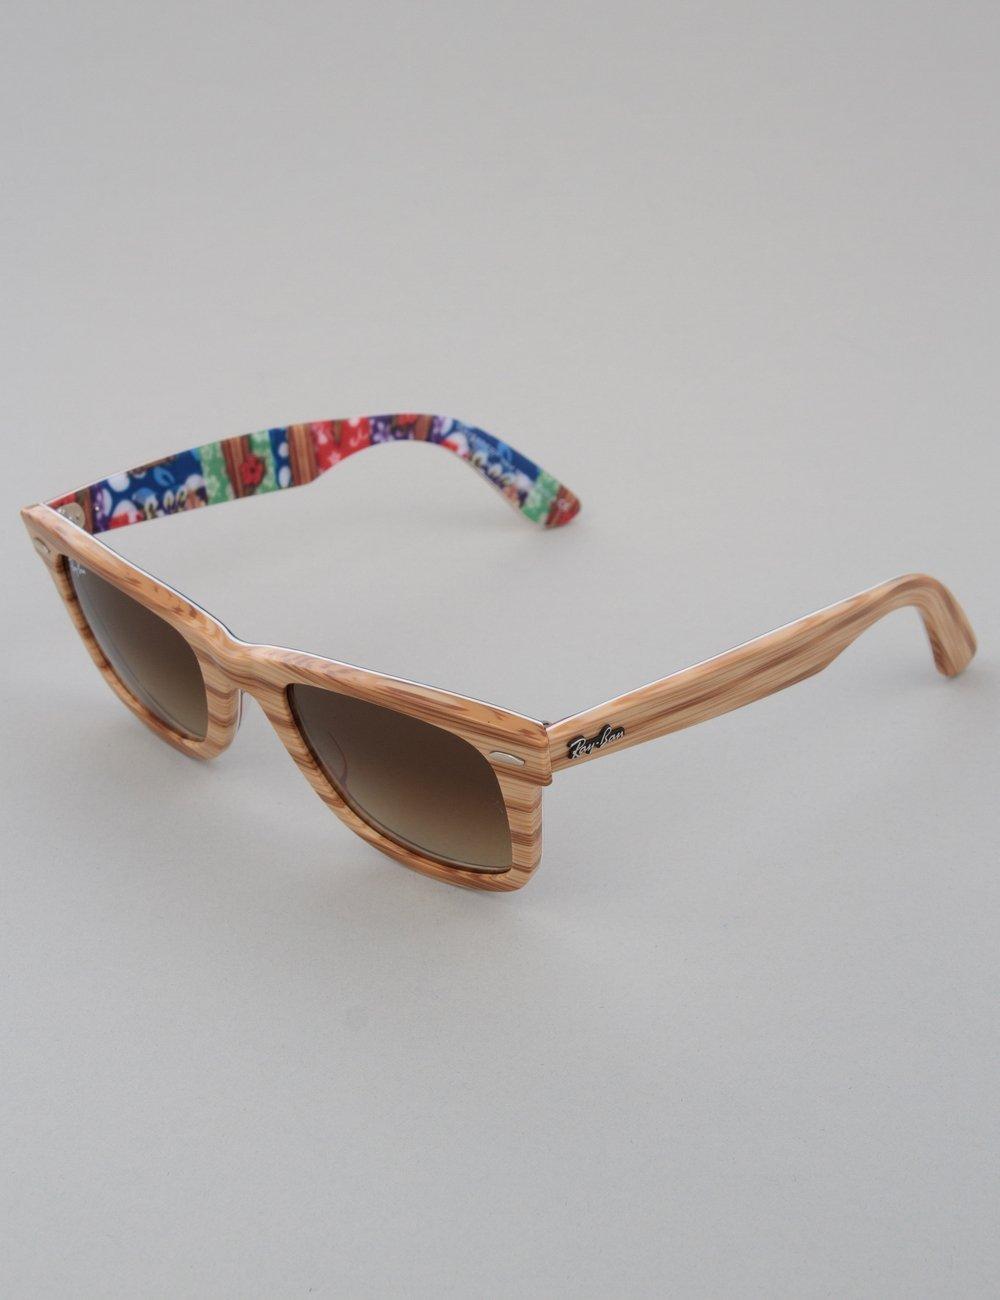 297bca683d Wood Ray Ban Wayfarer. Ray-Ban Original Wayfarer Sunglasses - Wood Surfs Up     Brown ...